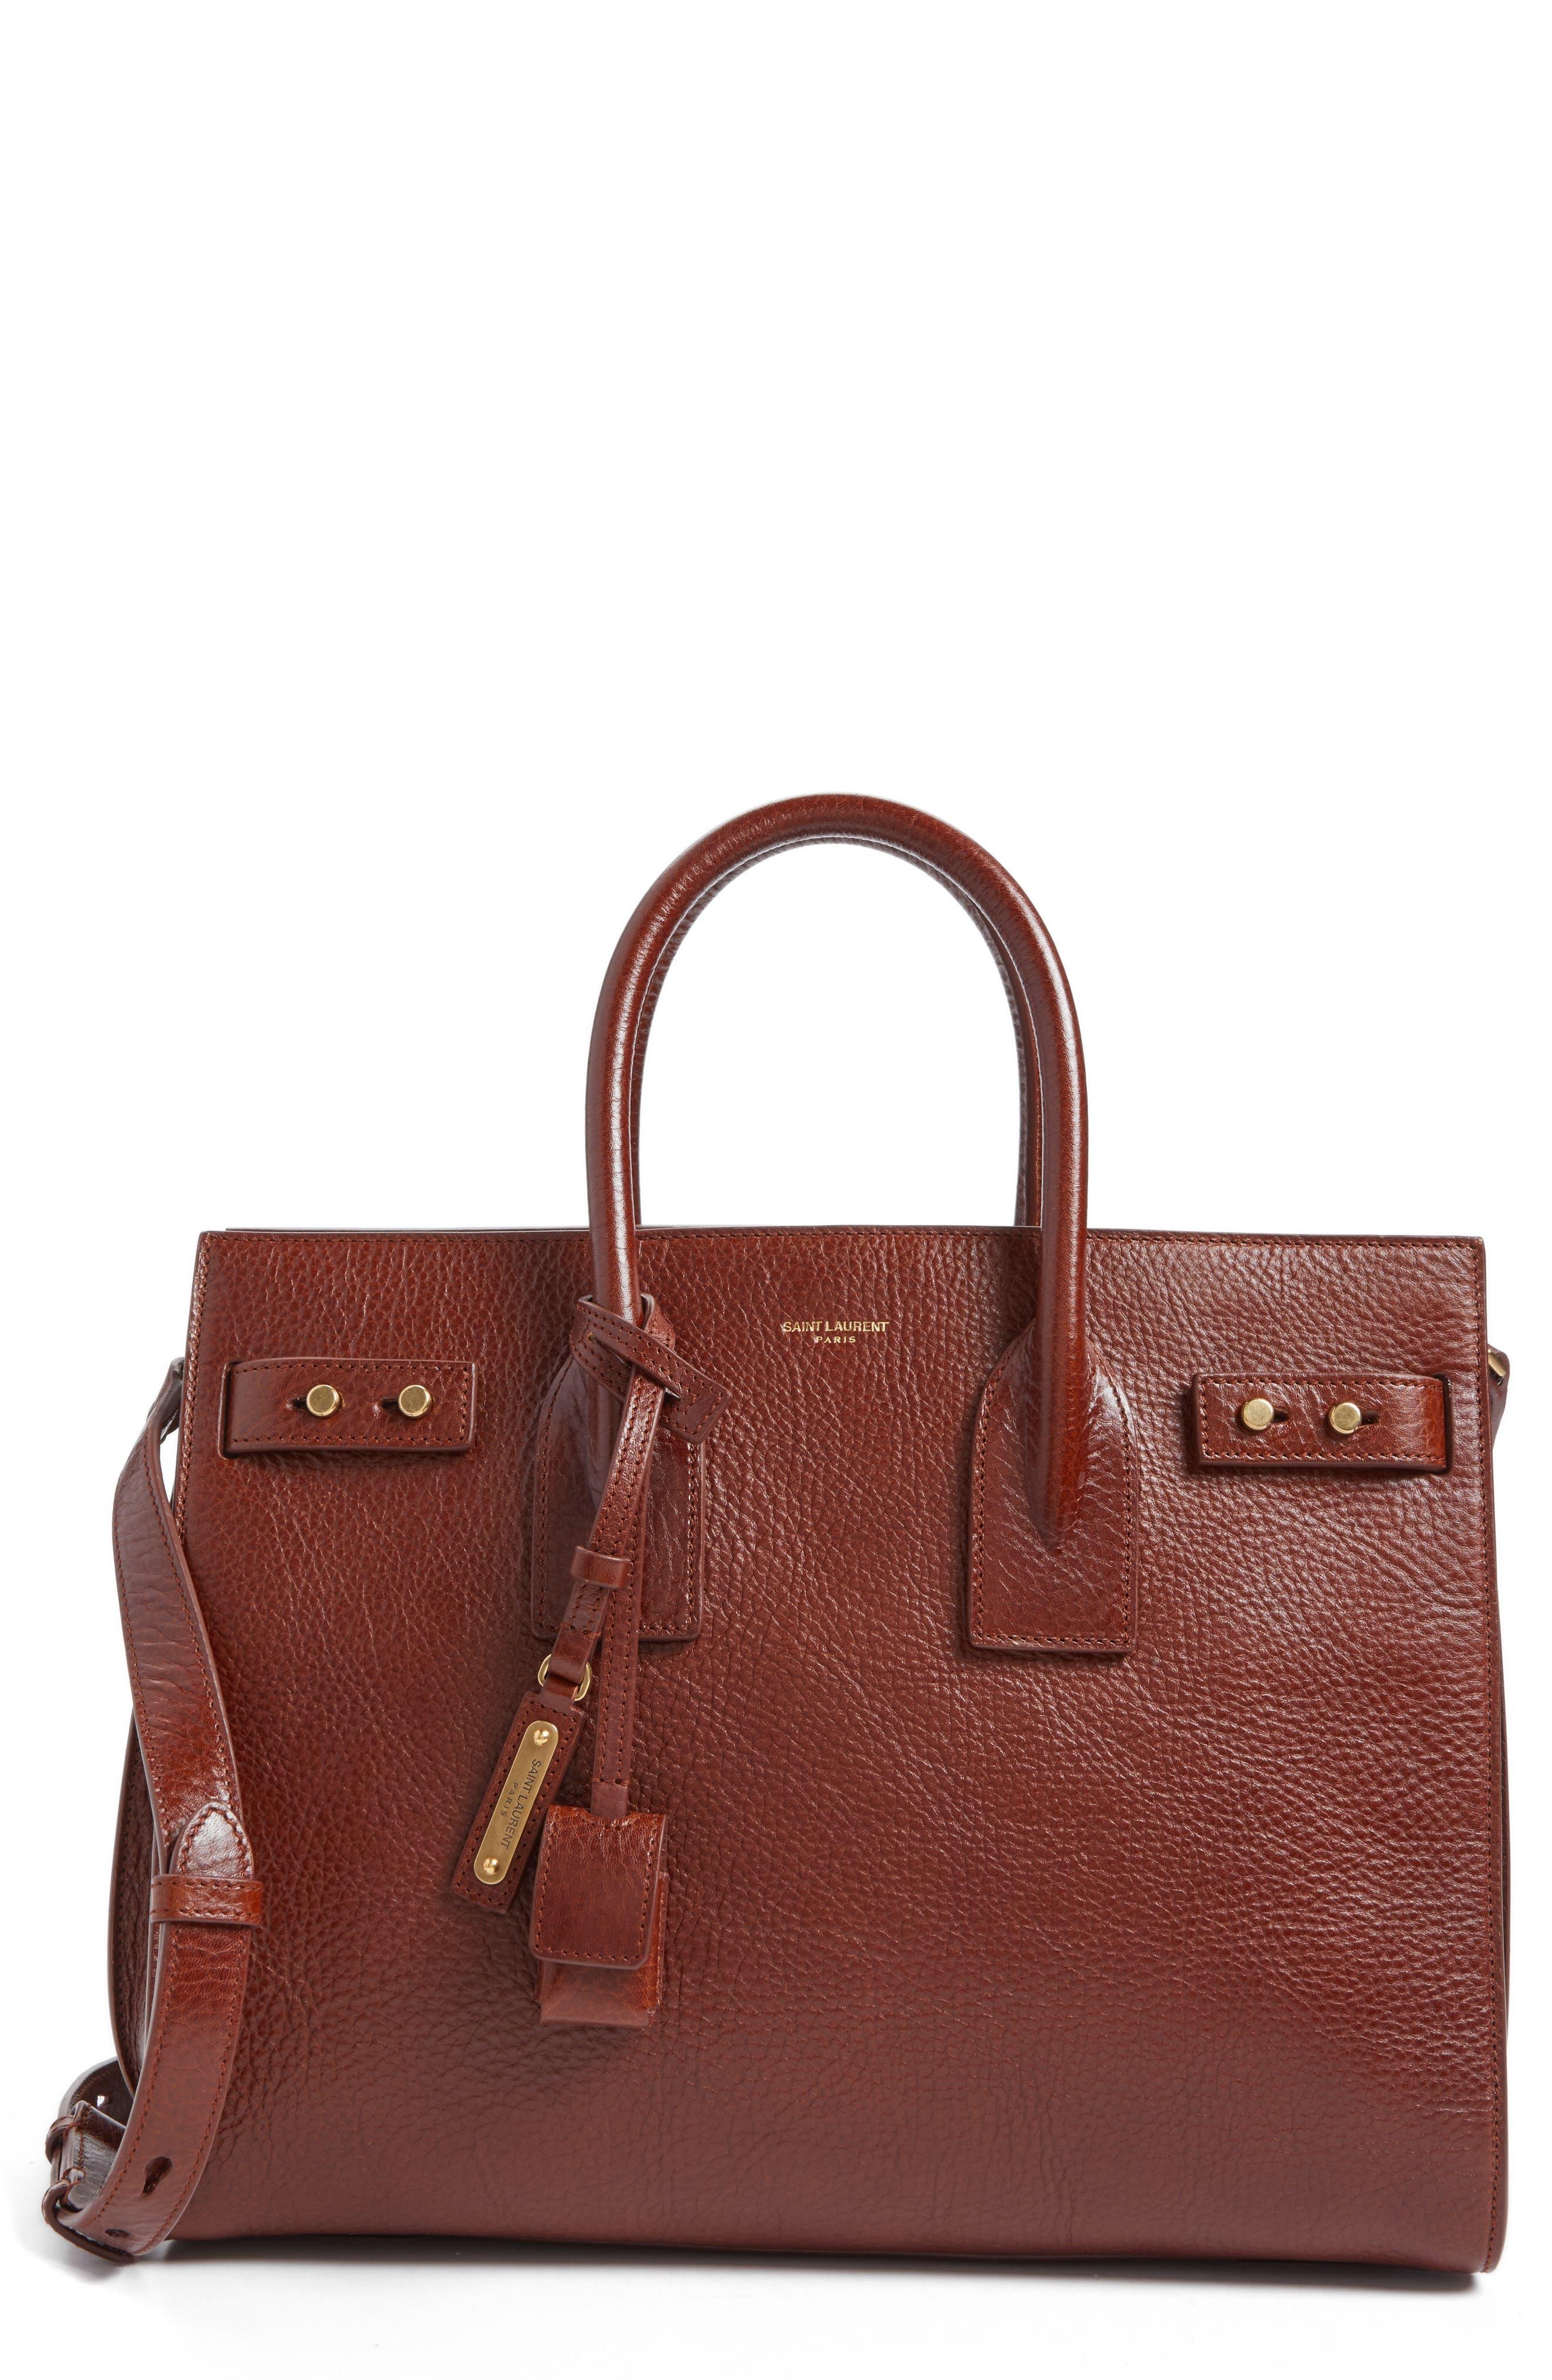 Small Sac de Jour Leather Tote,                         Main,                         color, Camel Brilliant